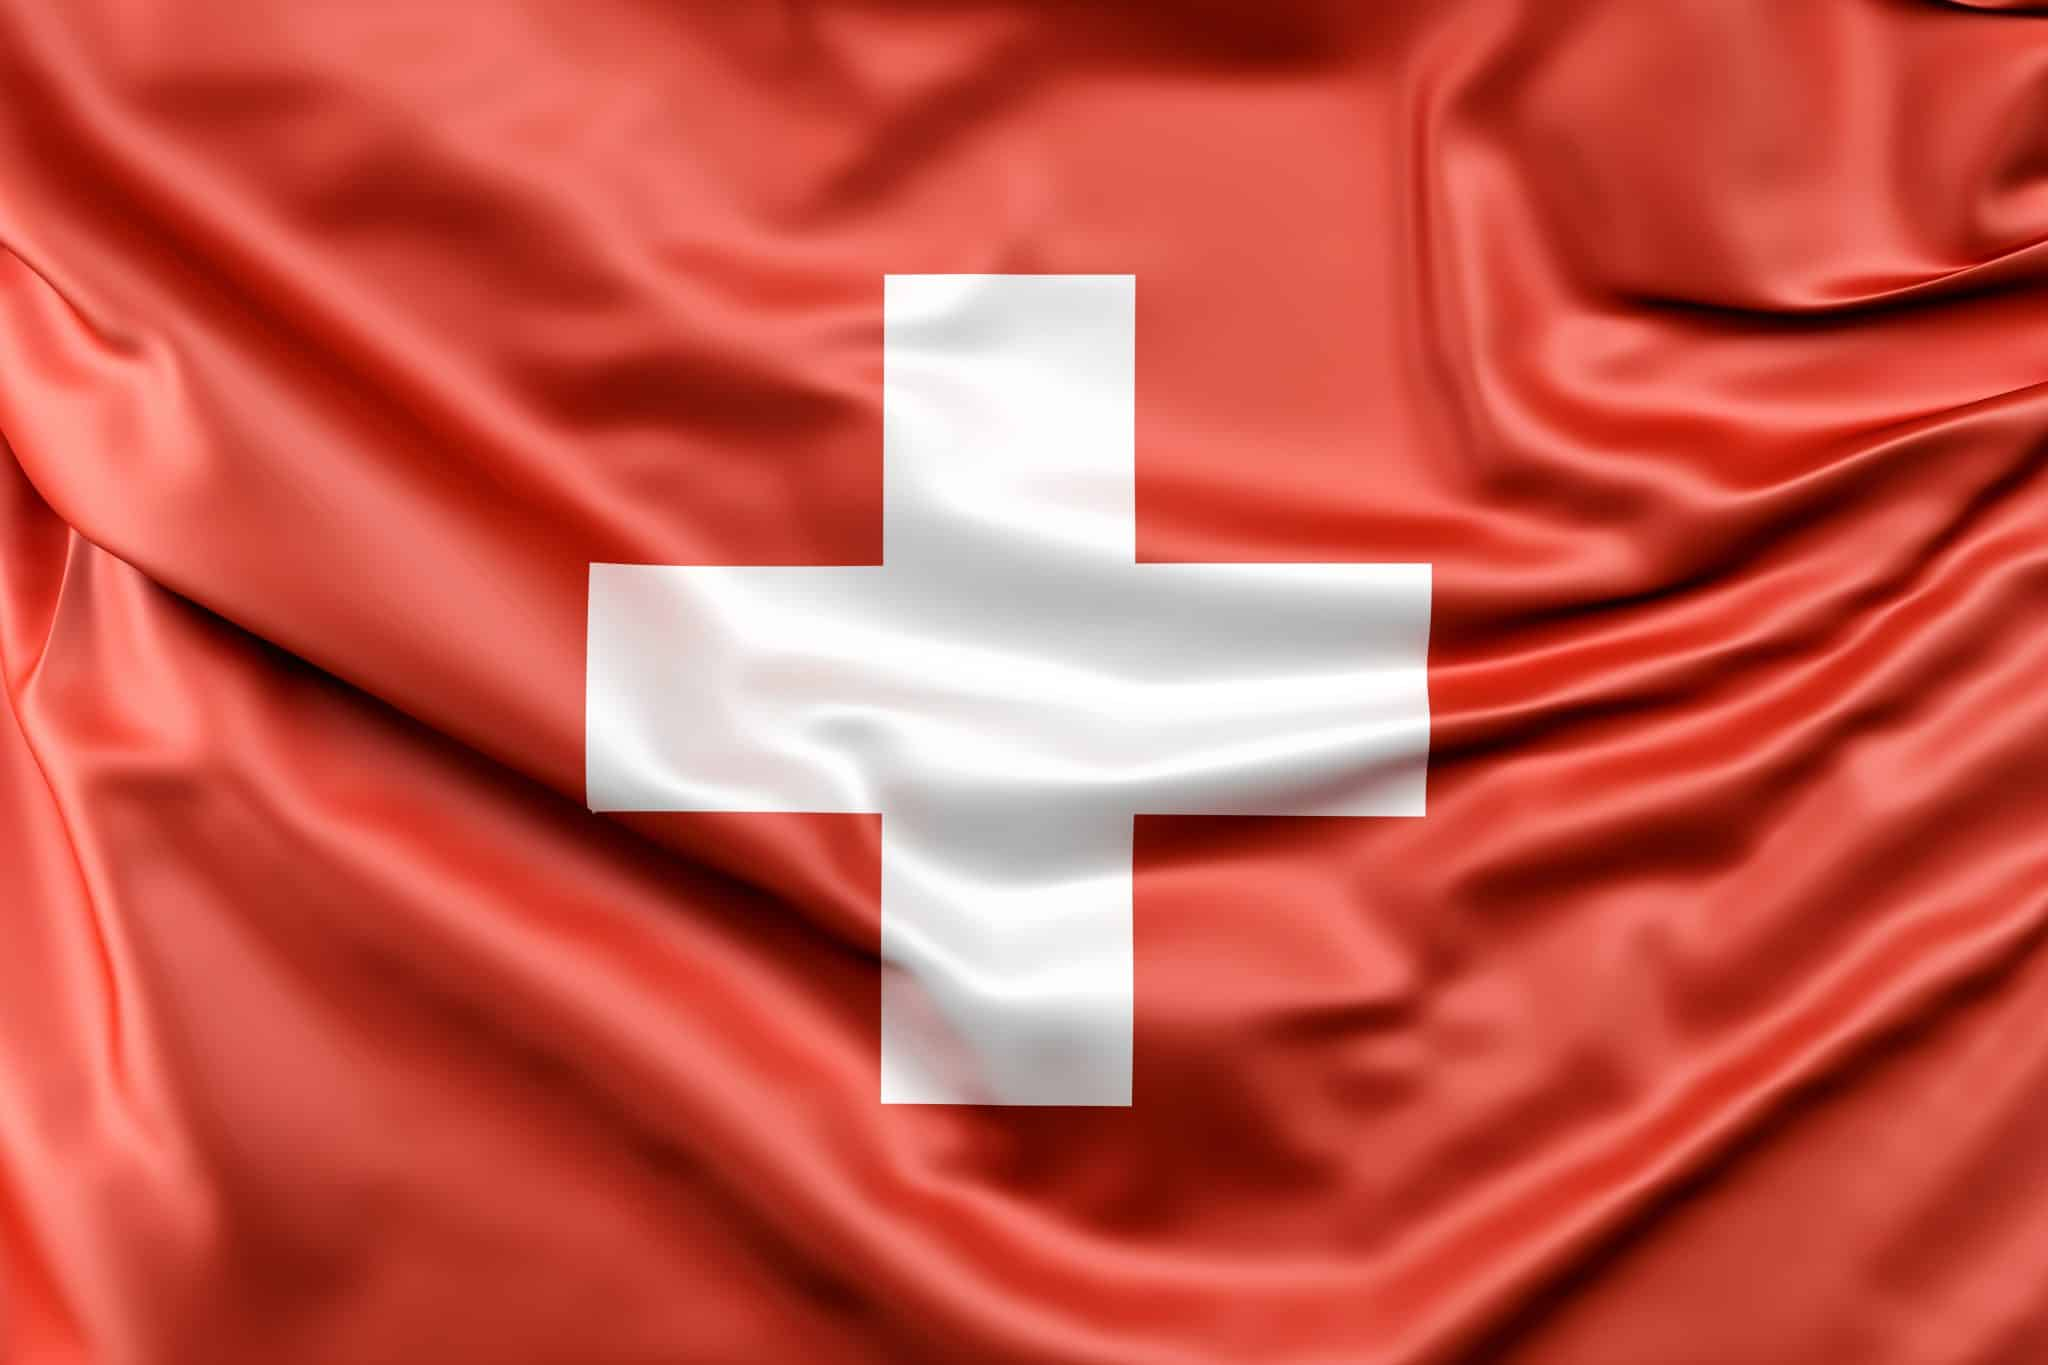 pannolini lavabili svizzera scaled